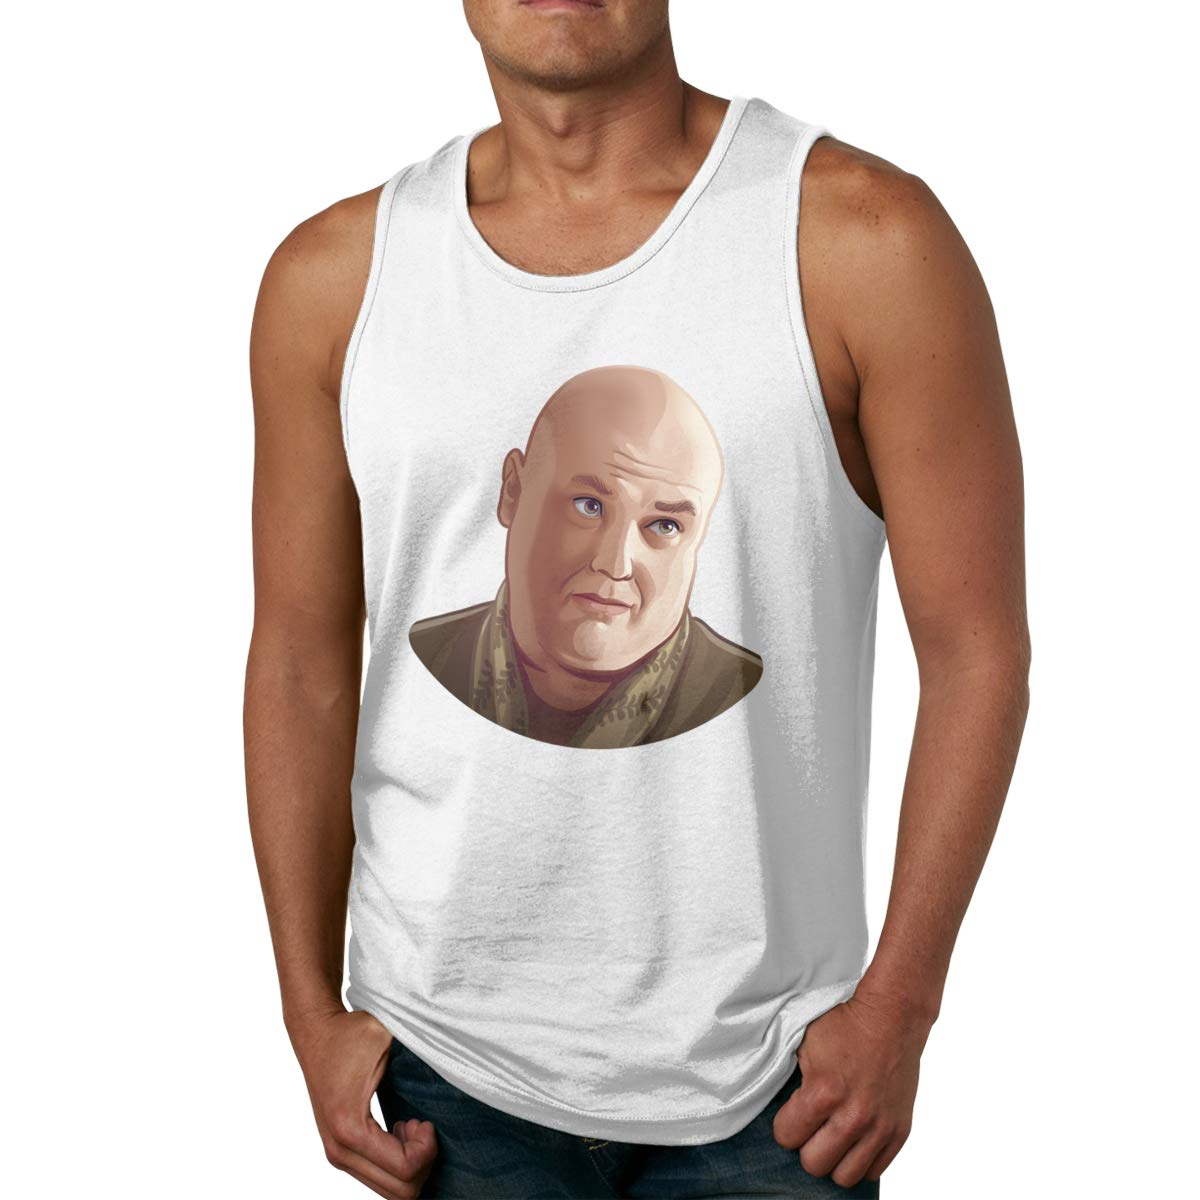 Mens Tank Tops Thrones Fun Shirts Summer Fun Tees Muscle T Shirt Top